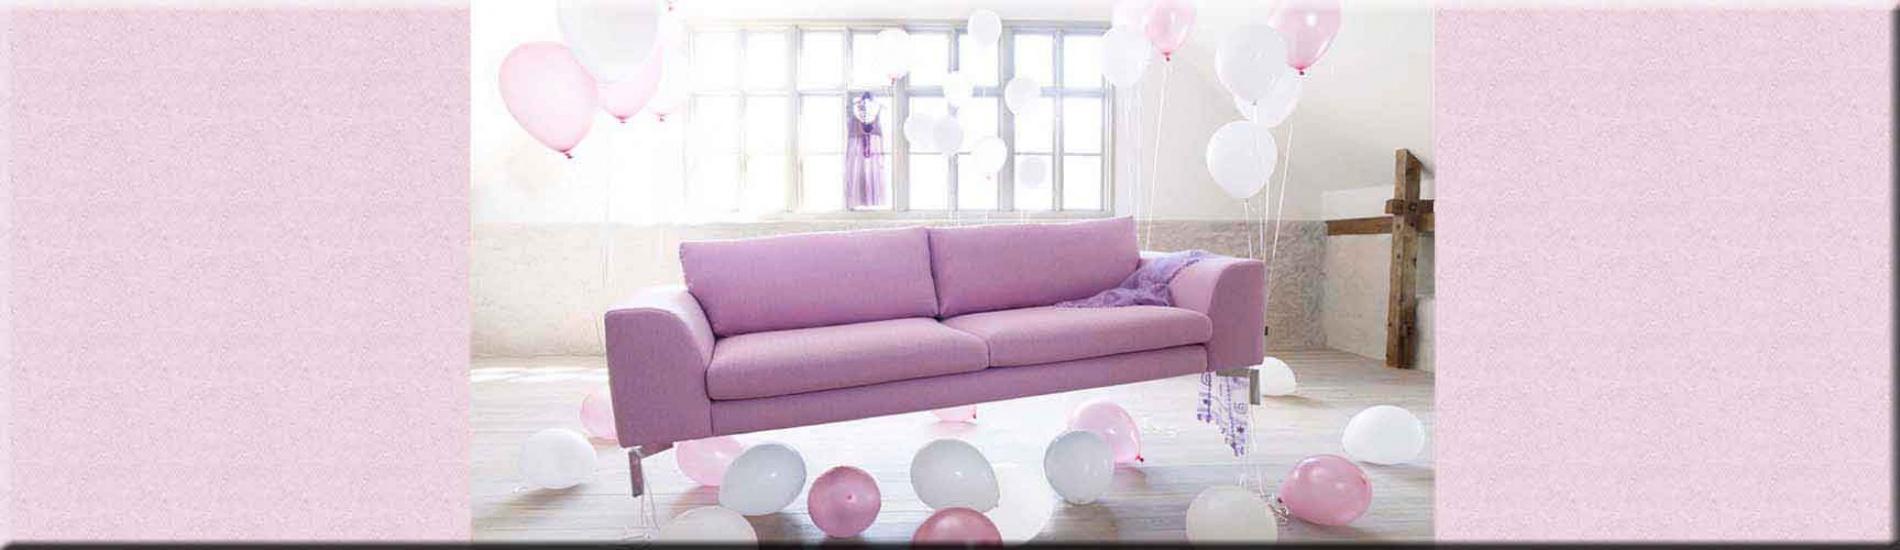 Sofa Woogie